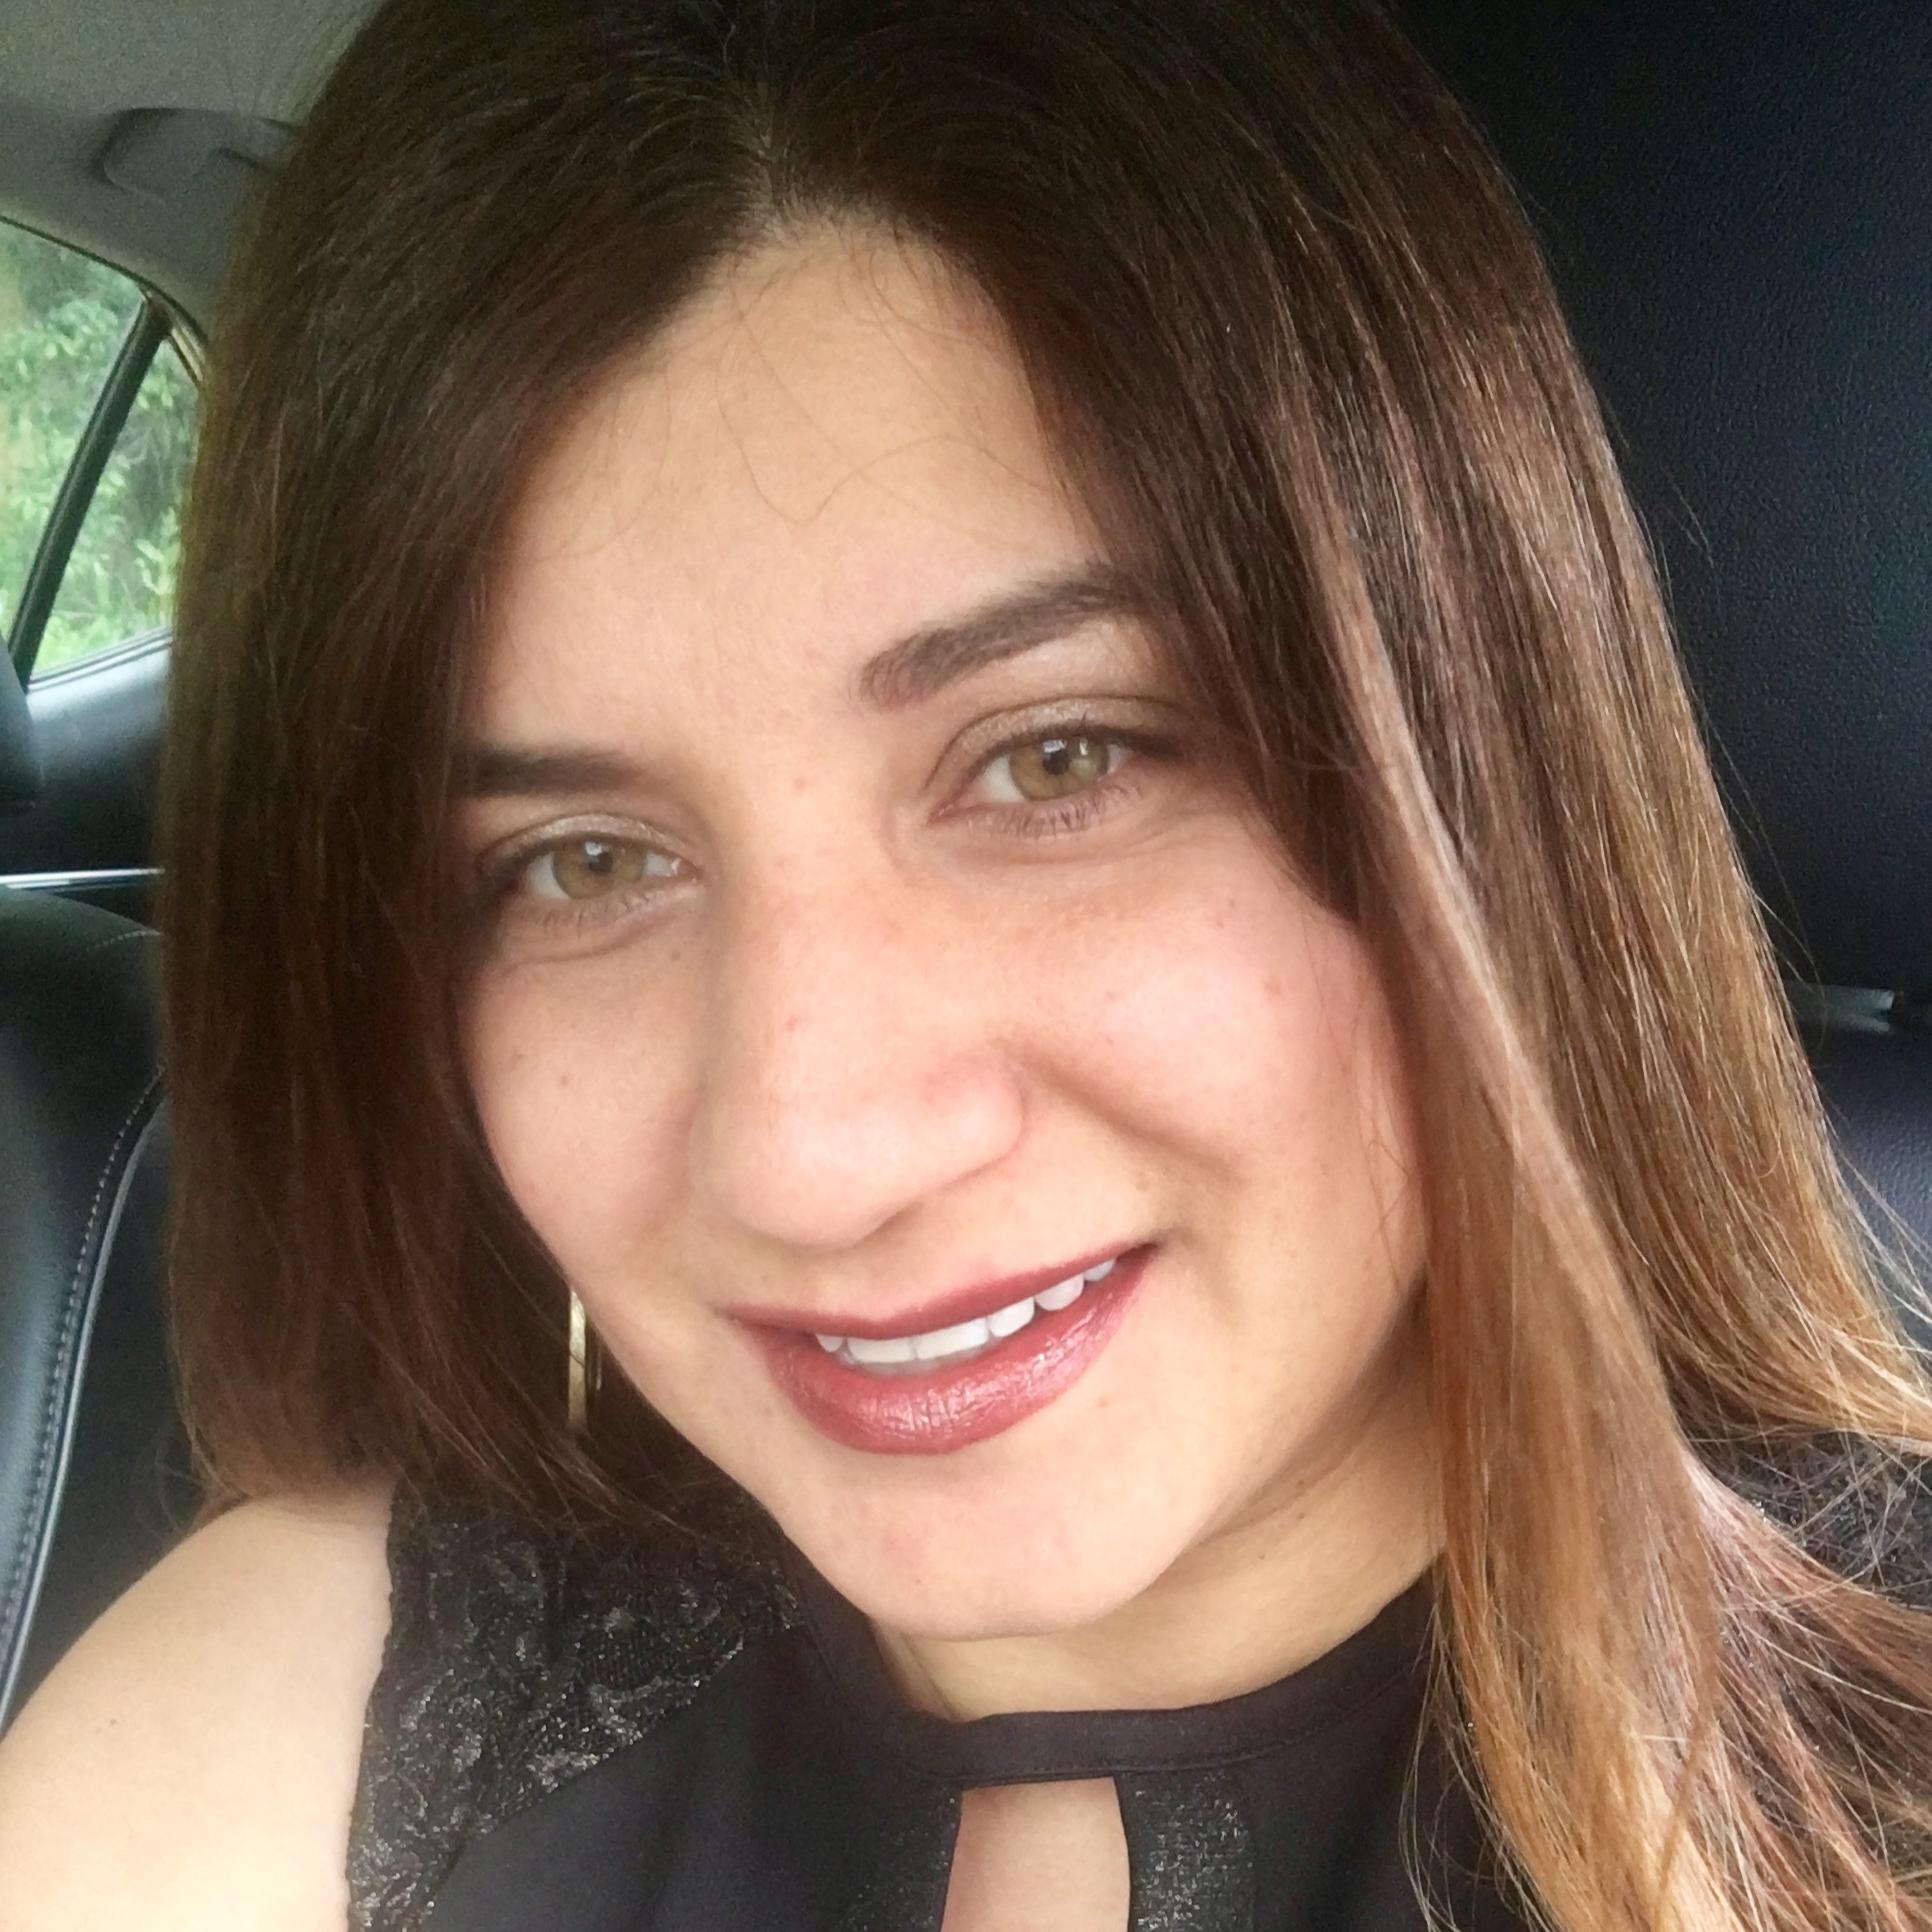 Dr. Zahra Sara Afshari, MD photo#0